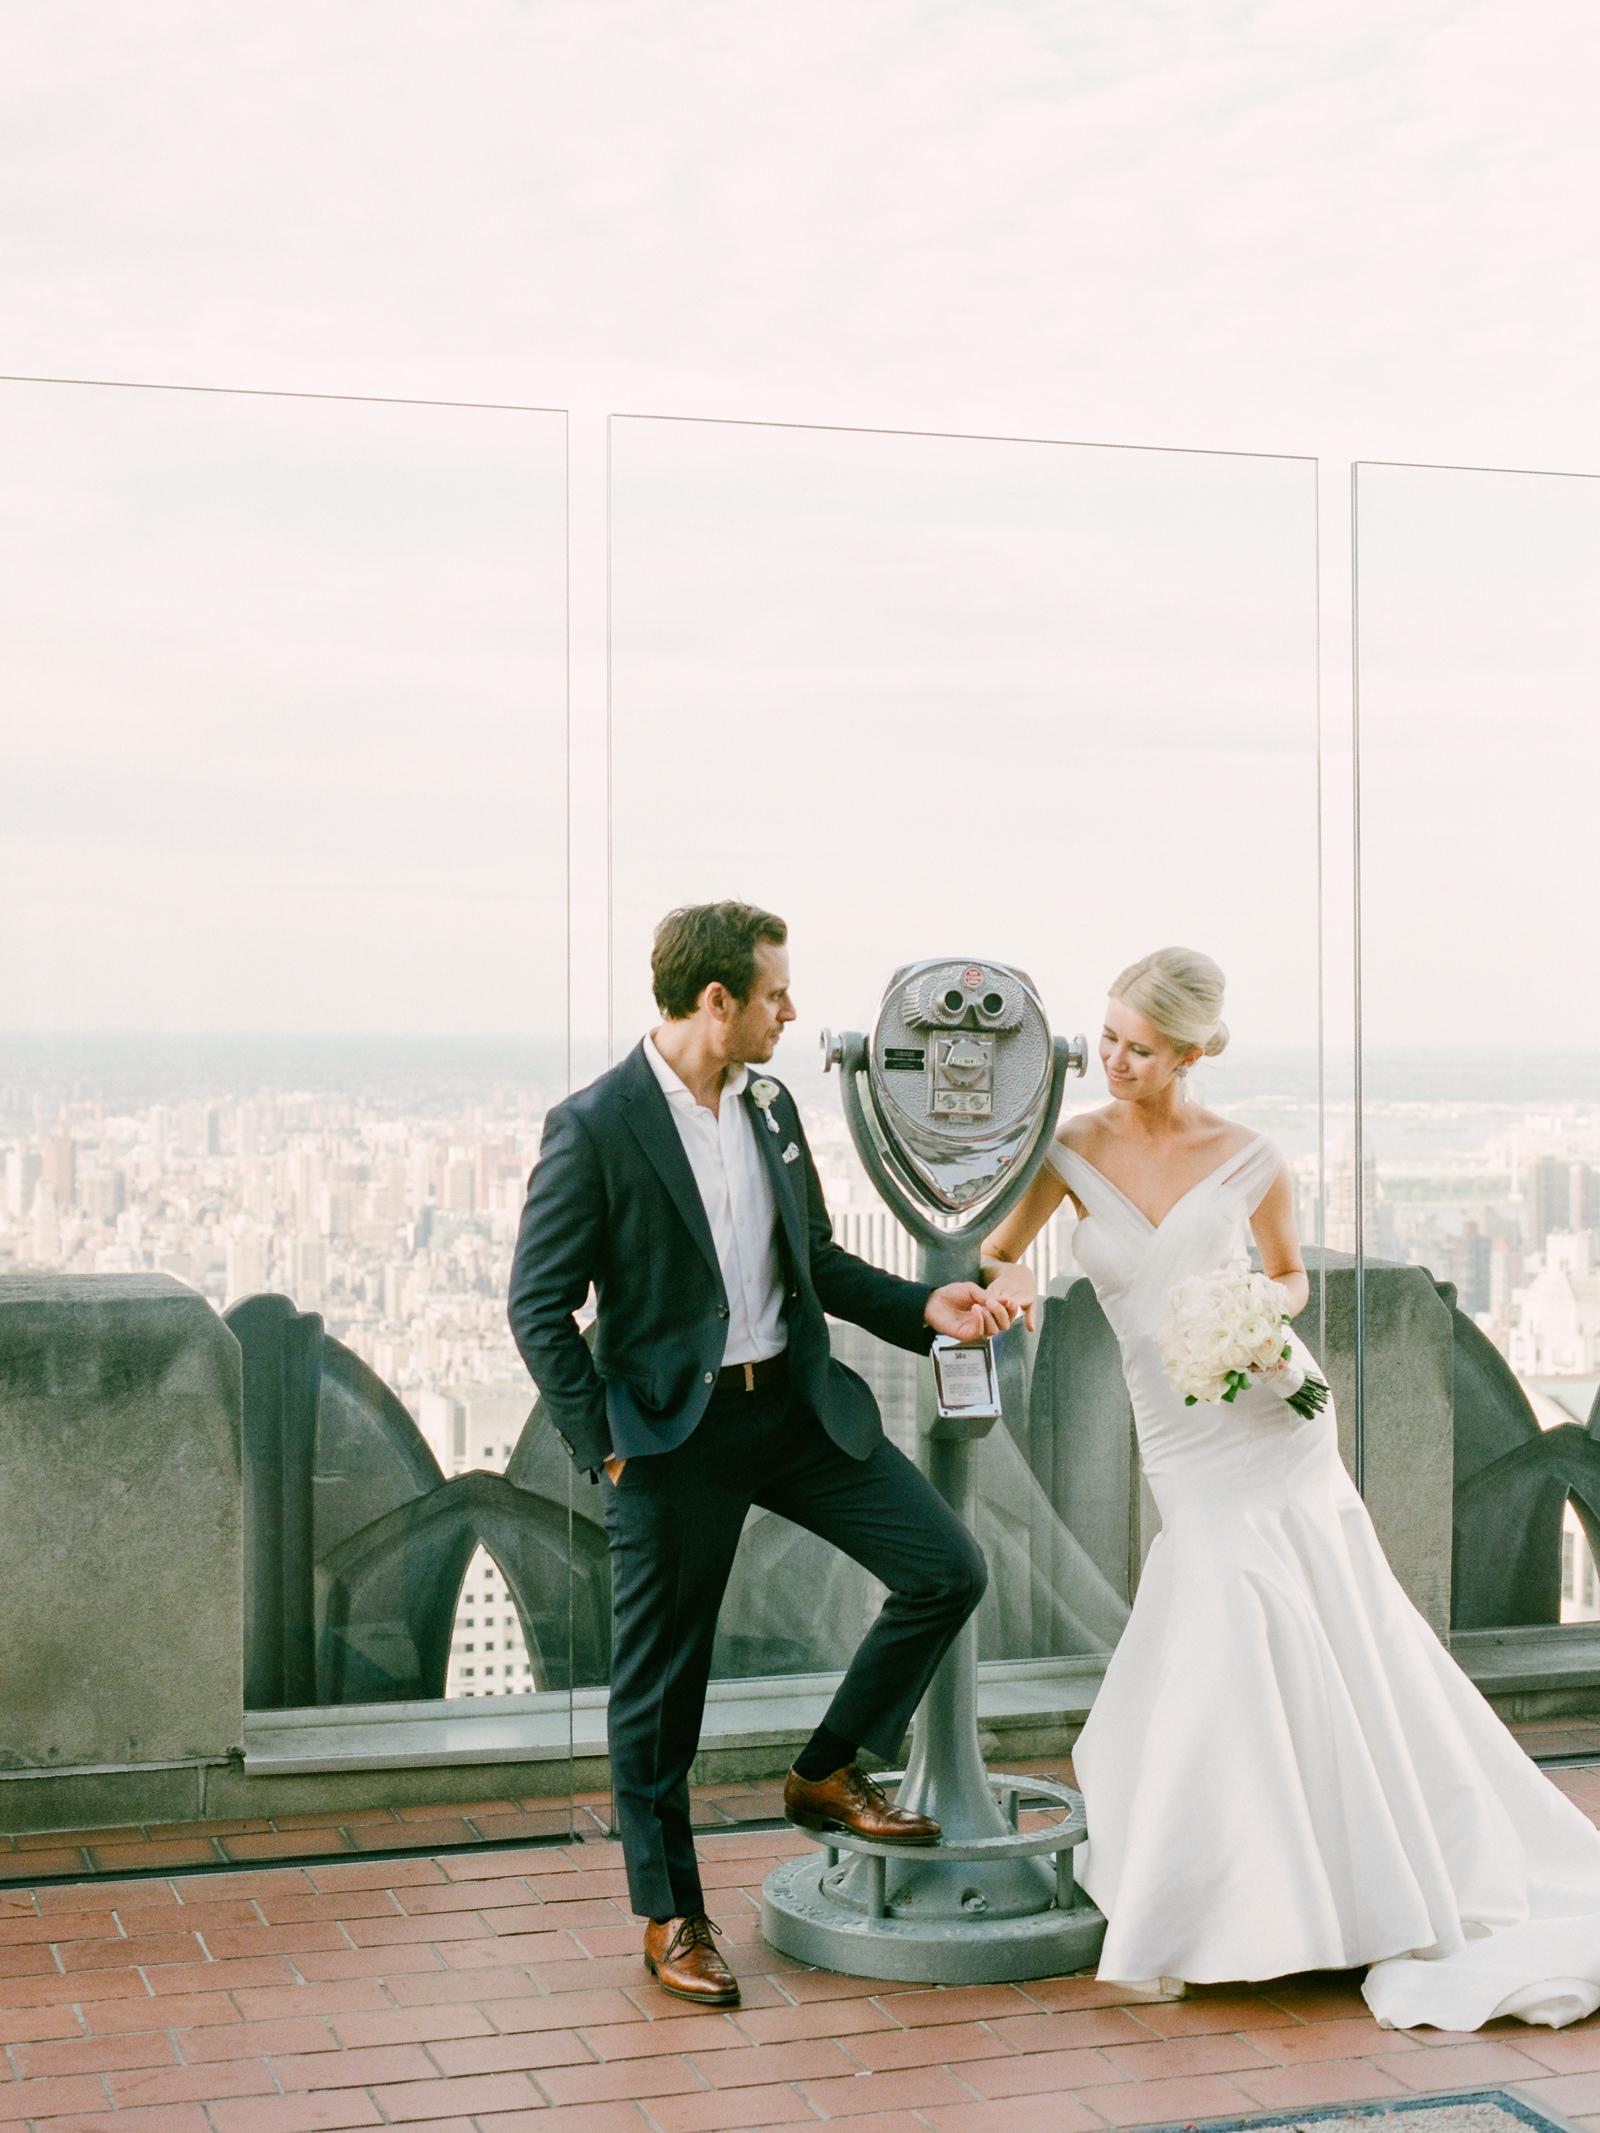 Intimate-NYC_wedding_ by Tanya Isaeva-151.jpg